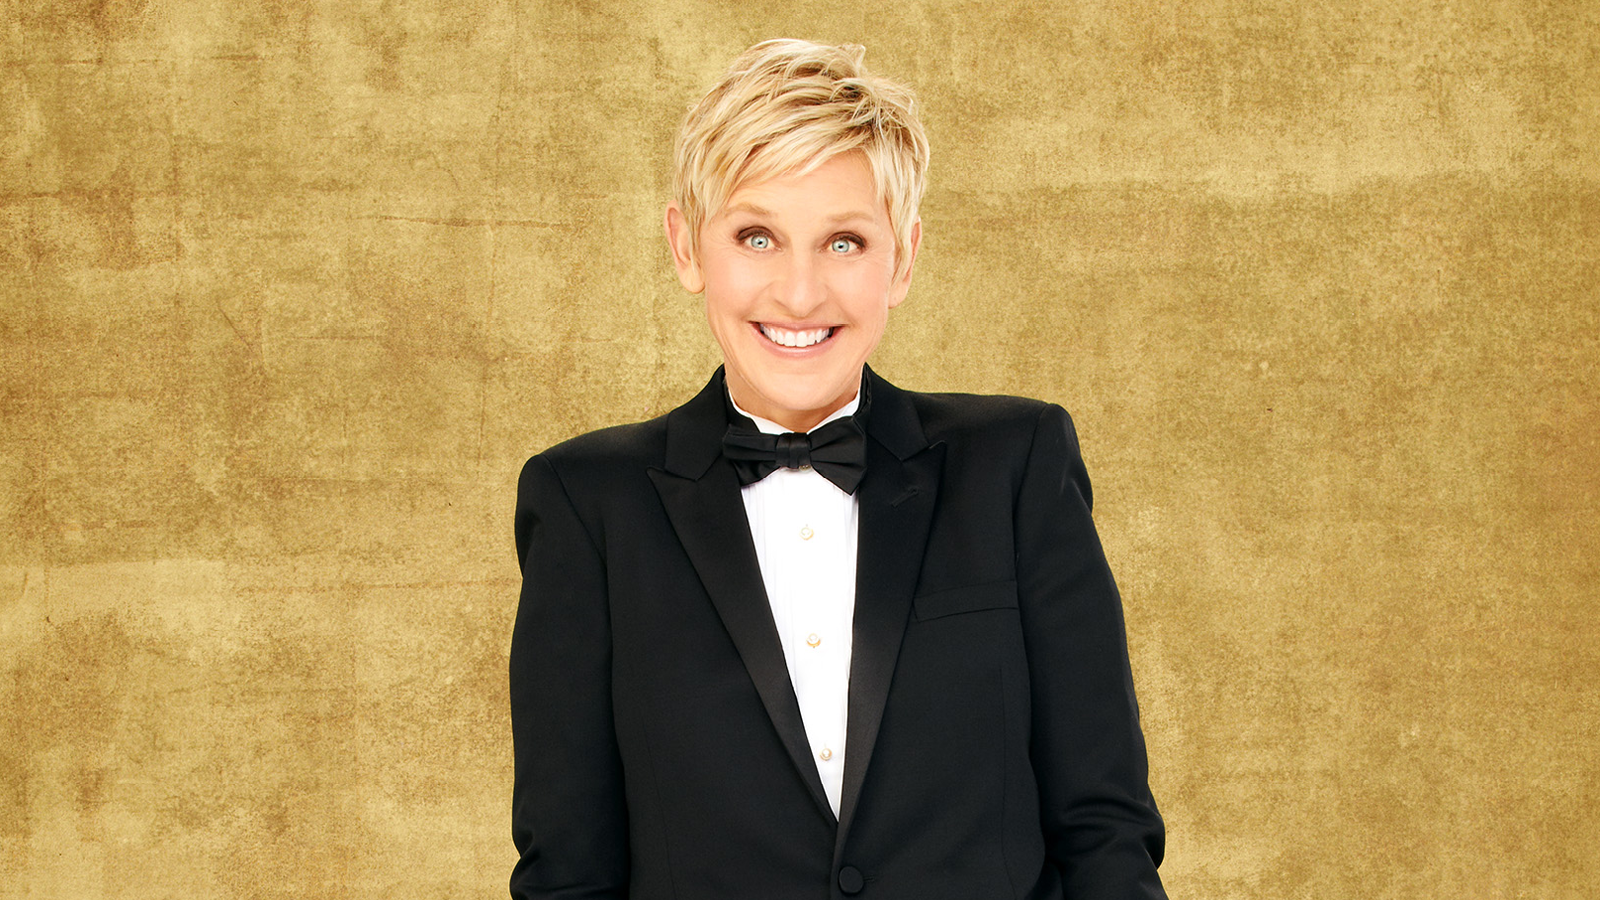 16 Inspirational Voices for LGBTQ Equality in 2016: Ellen DeGeneres